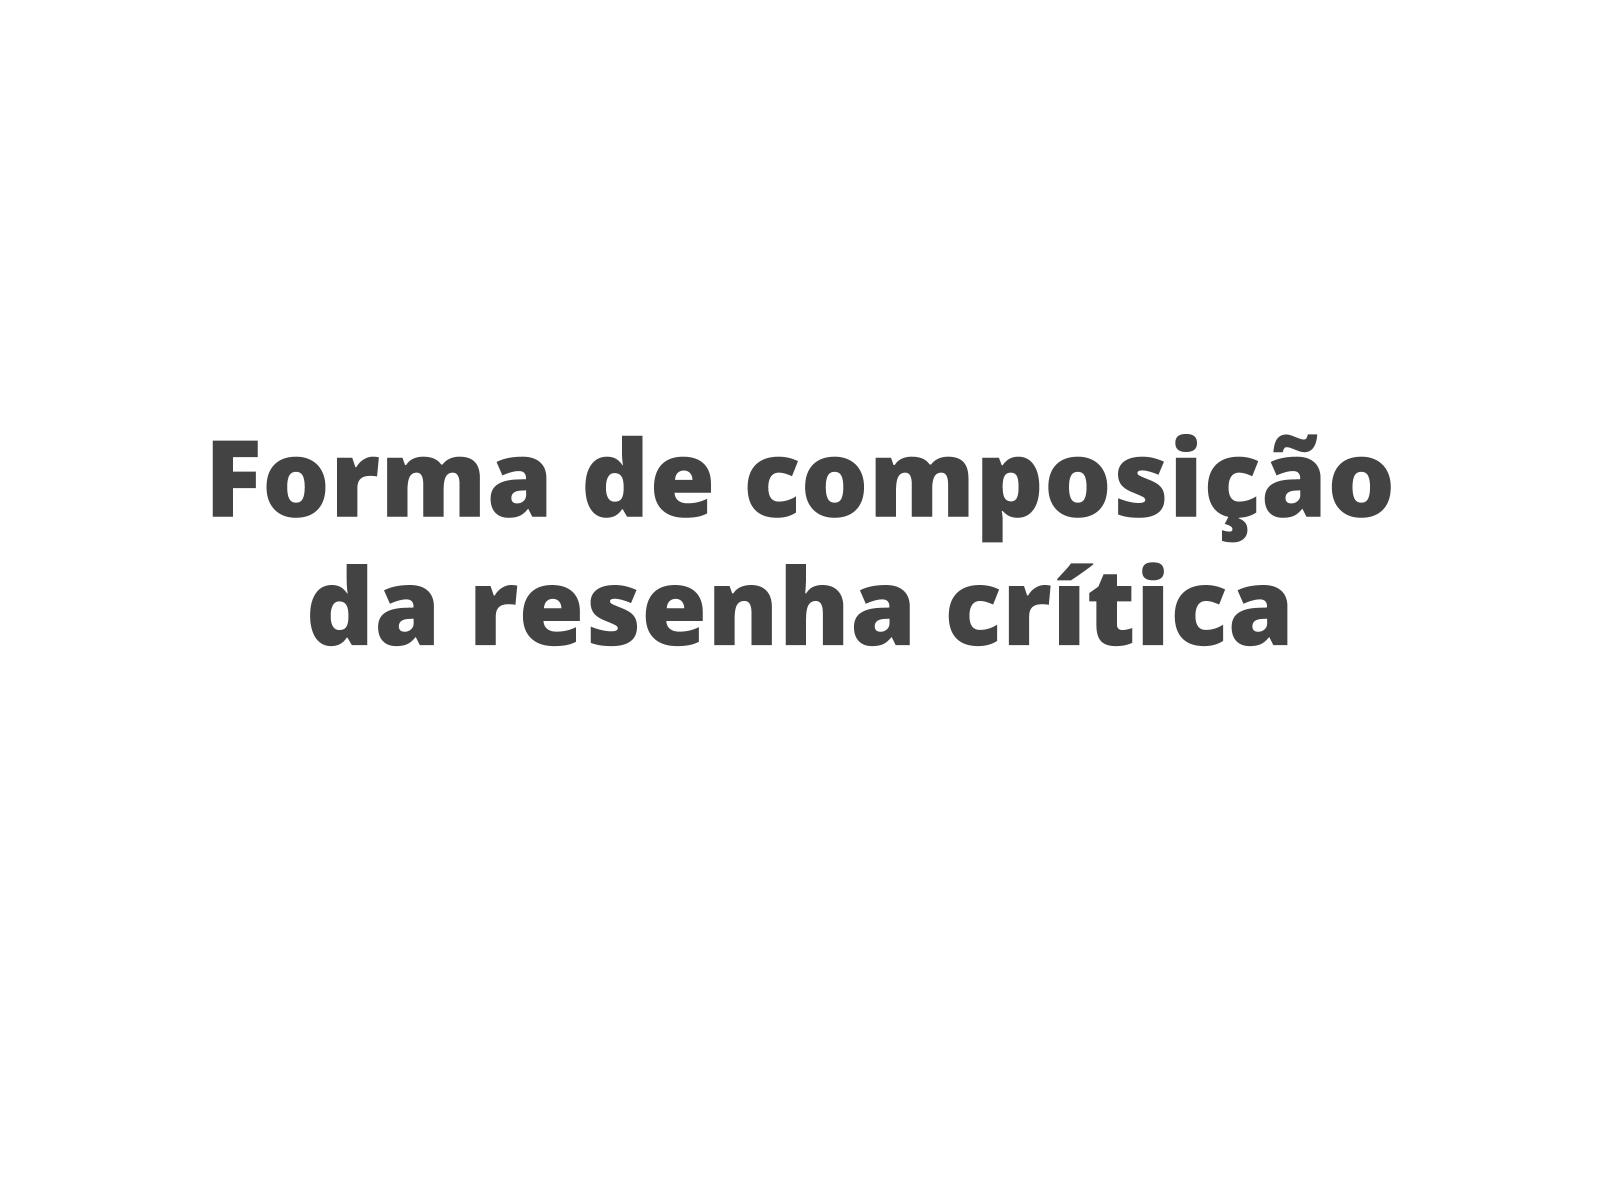 Resenha crítica - Análise Linguística / Semiótica